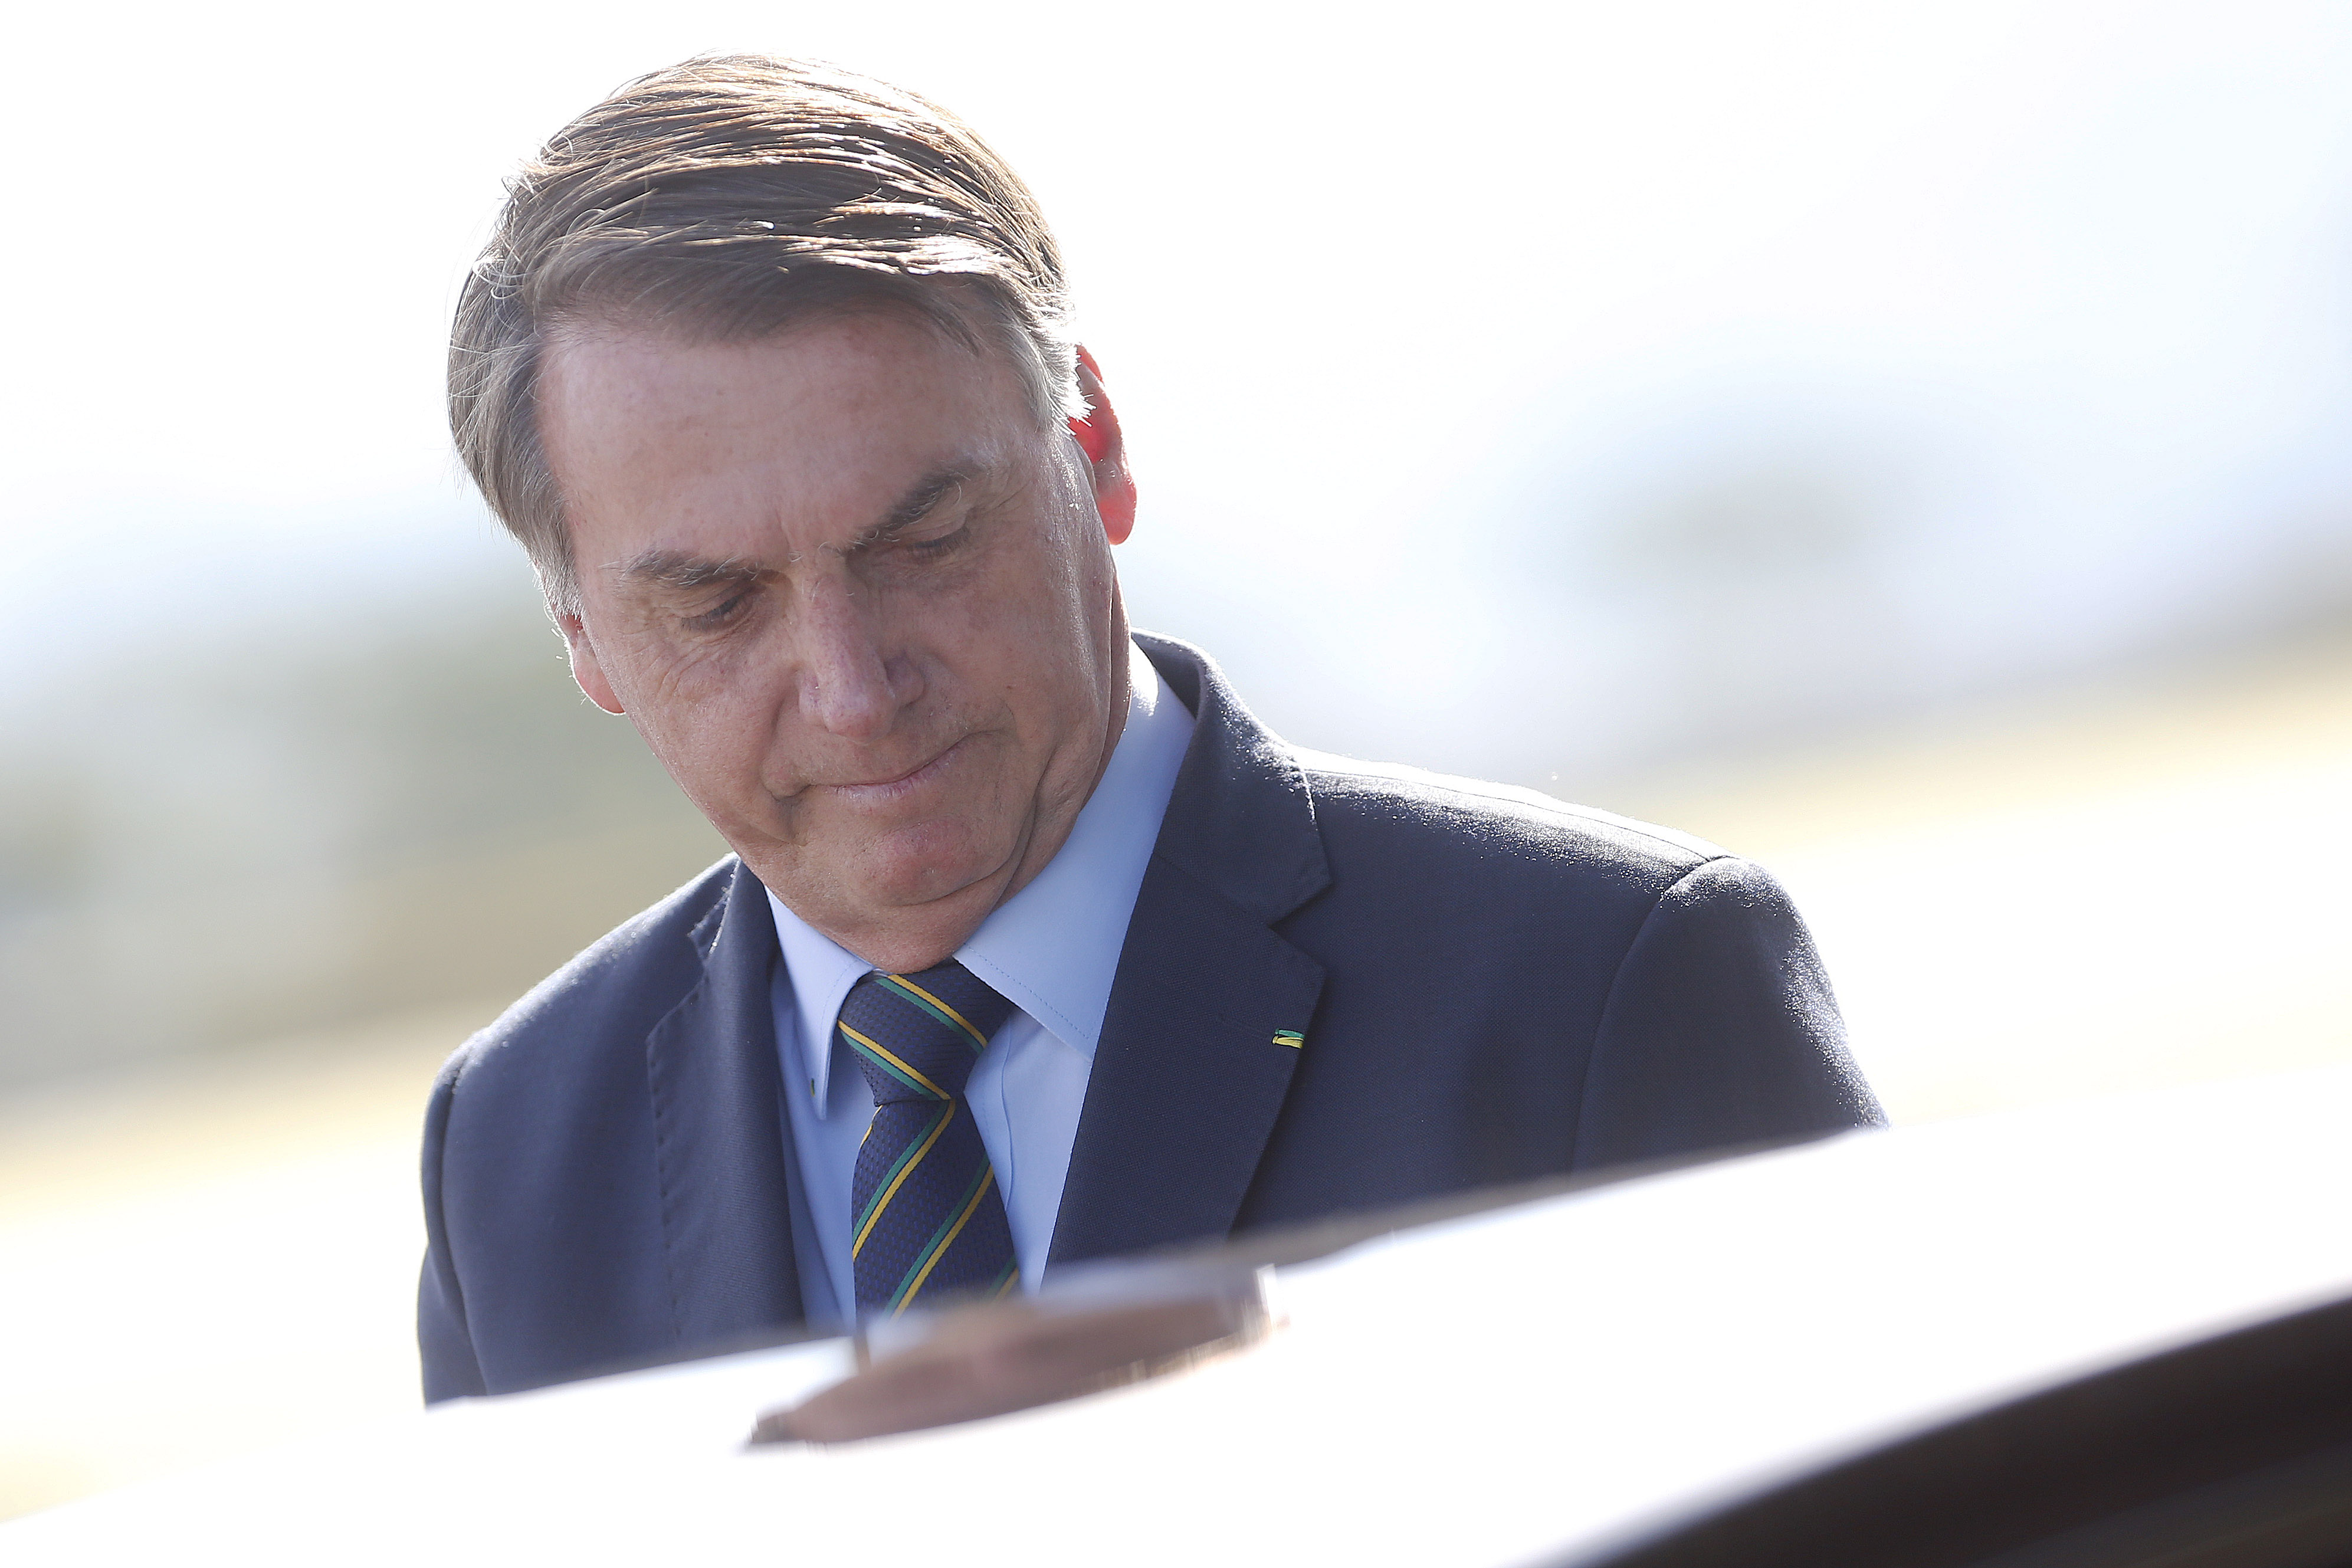 Para Ajufe, post de Bolsonaro é ameaça ao ministro Celso de Mello ...